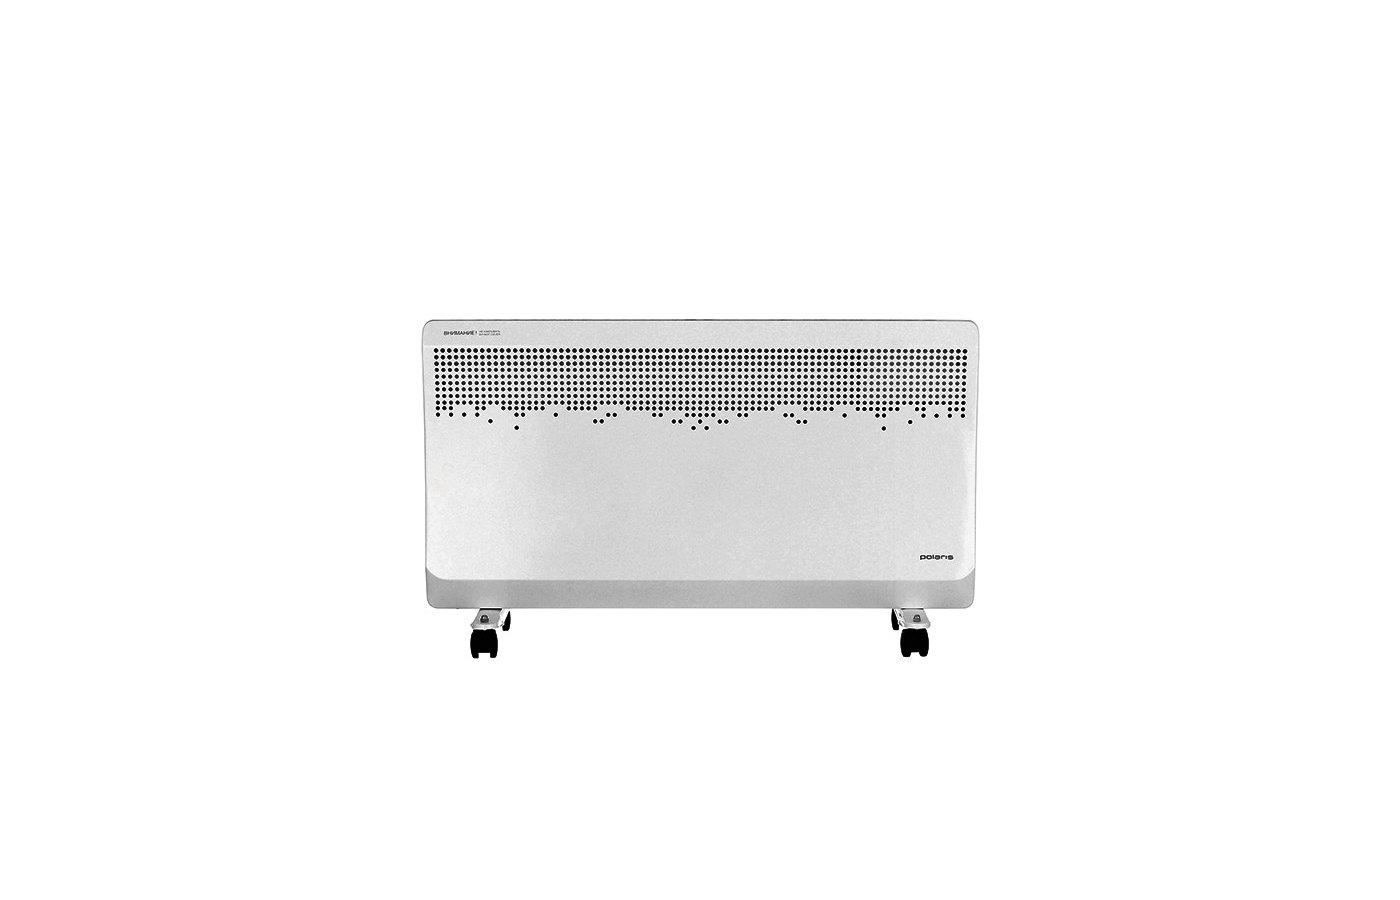 Конвектор POLARIS PCH 2086